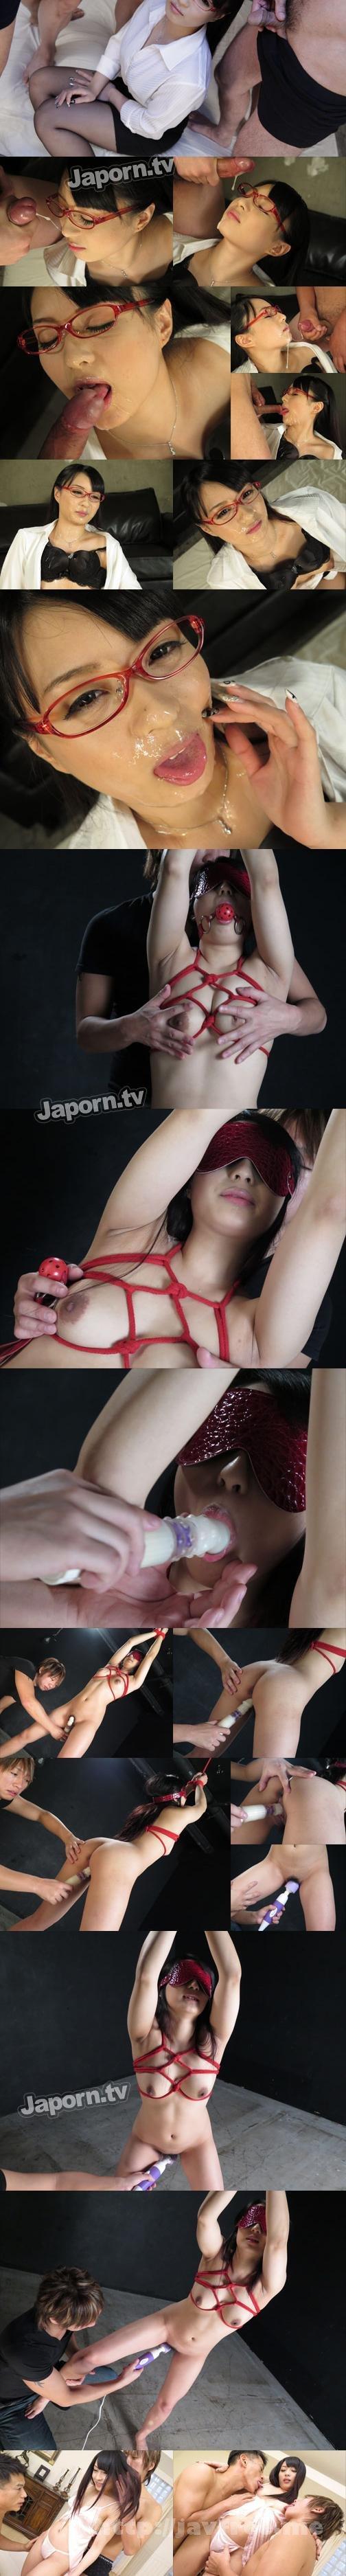 [SKY 311] スカイエンジェル Vol.186 : 桜井心菜 桜井心菜 SKY Kokona Sakurai